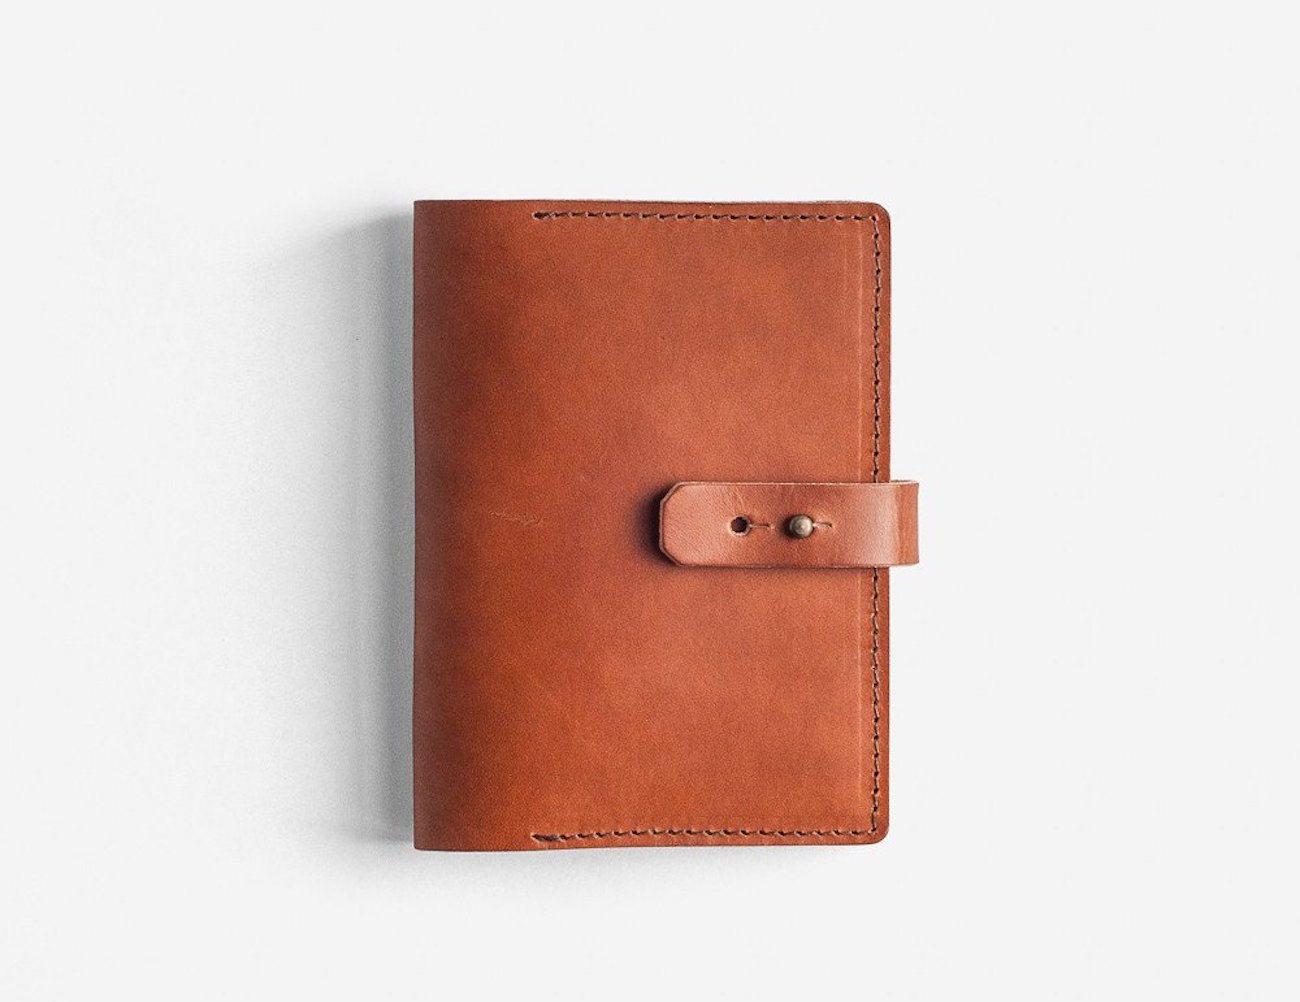 hazelnut-book-wallet-a6-by-noise-goods-03